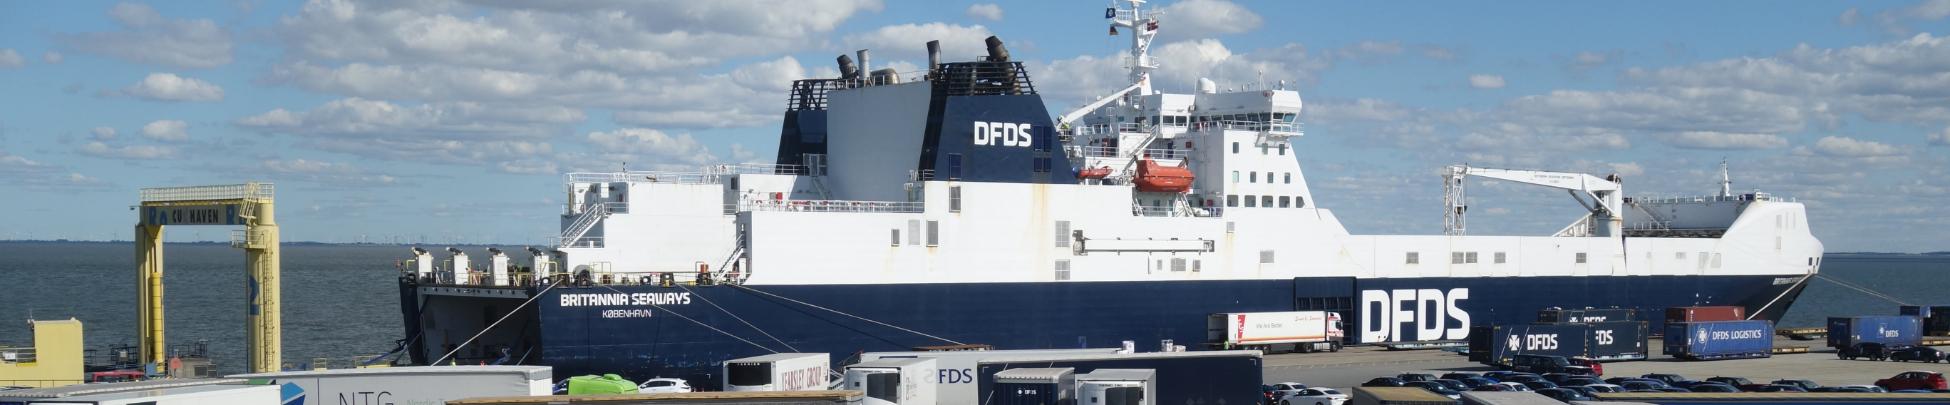 https://www.seaports.de/content/uploads/Britannia-Seaways-CUX_banner.jpg